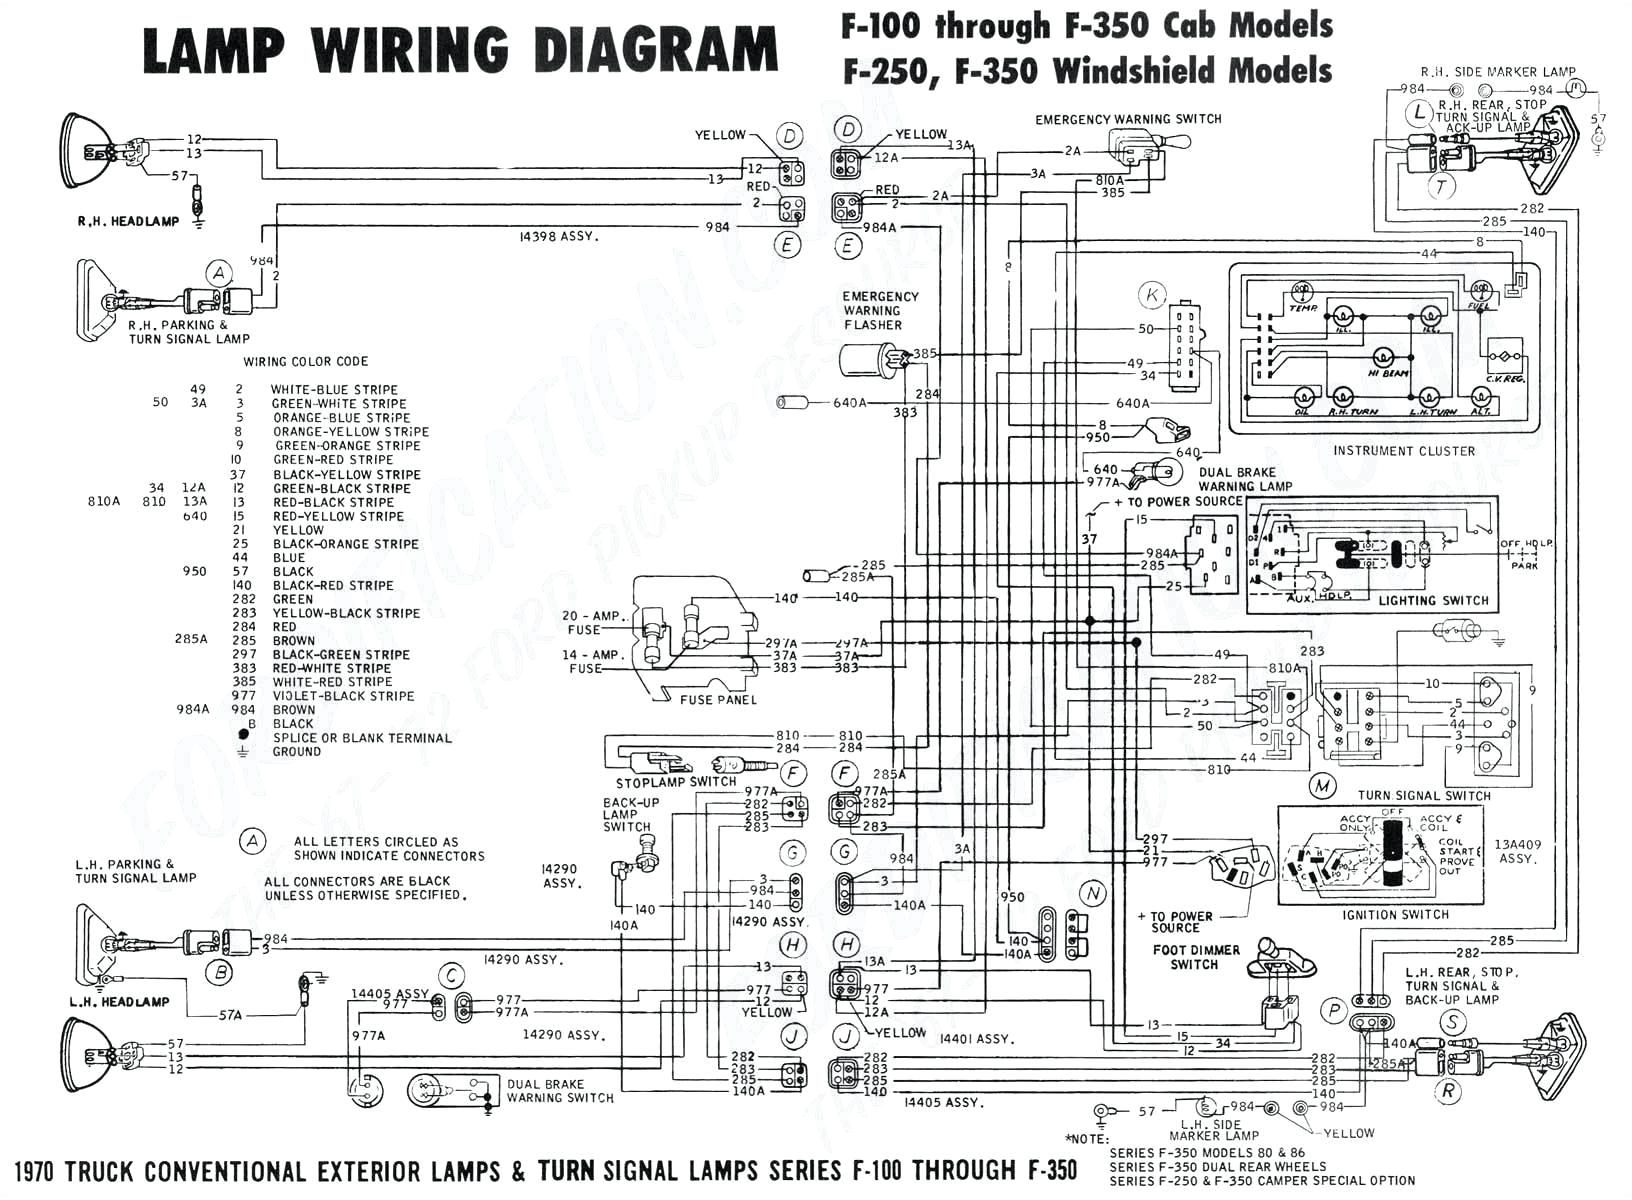 camshaft sensor wiring diagram fresh ford camshaft position sensor wiring diagram basic wiring diagram